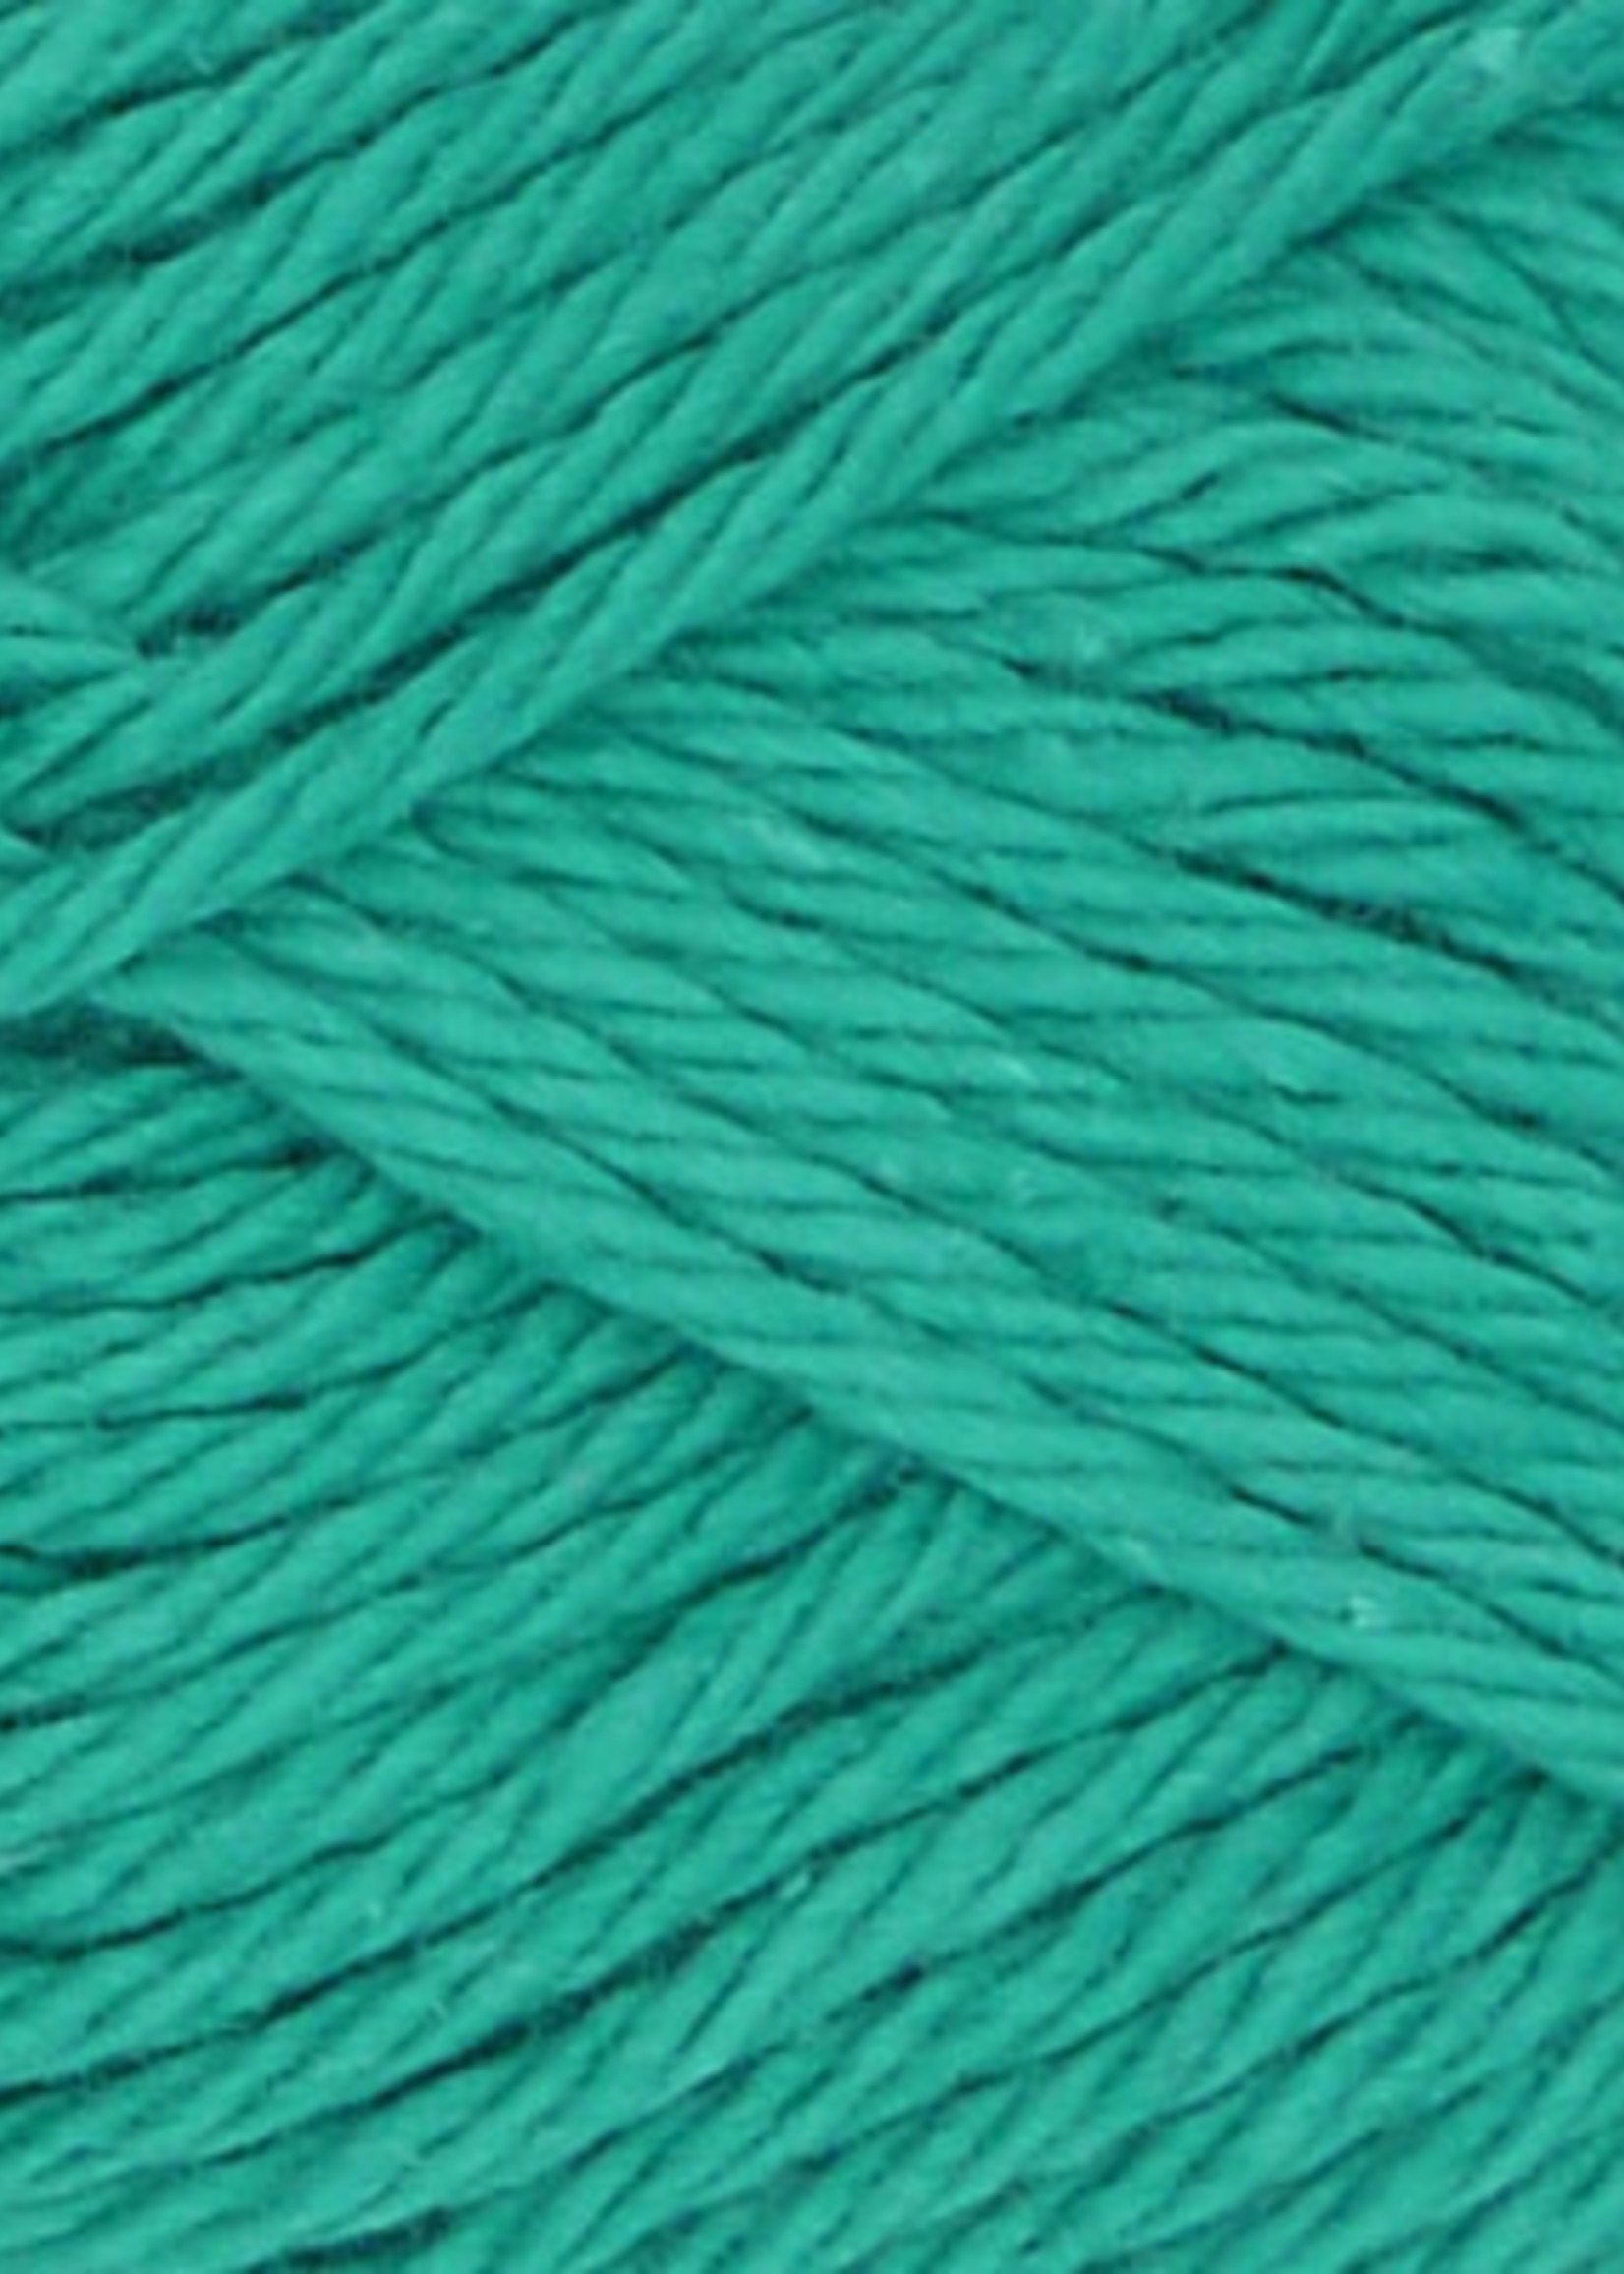 Estelle Yarns Sudz Cotton #53926 Teal